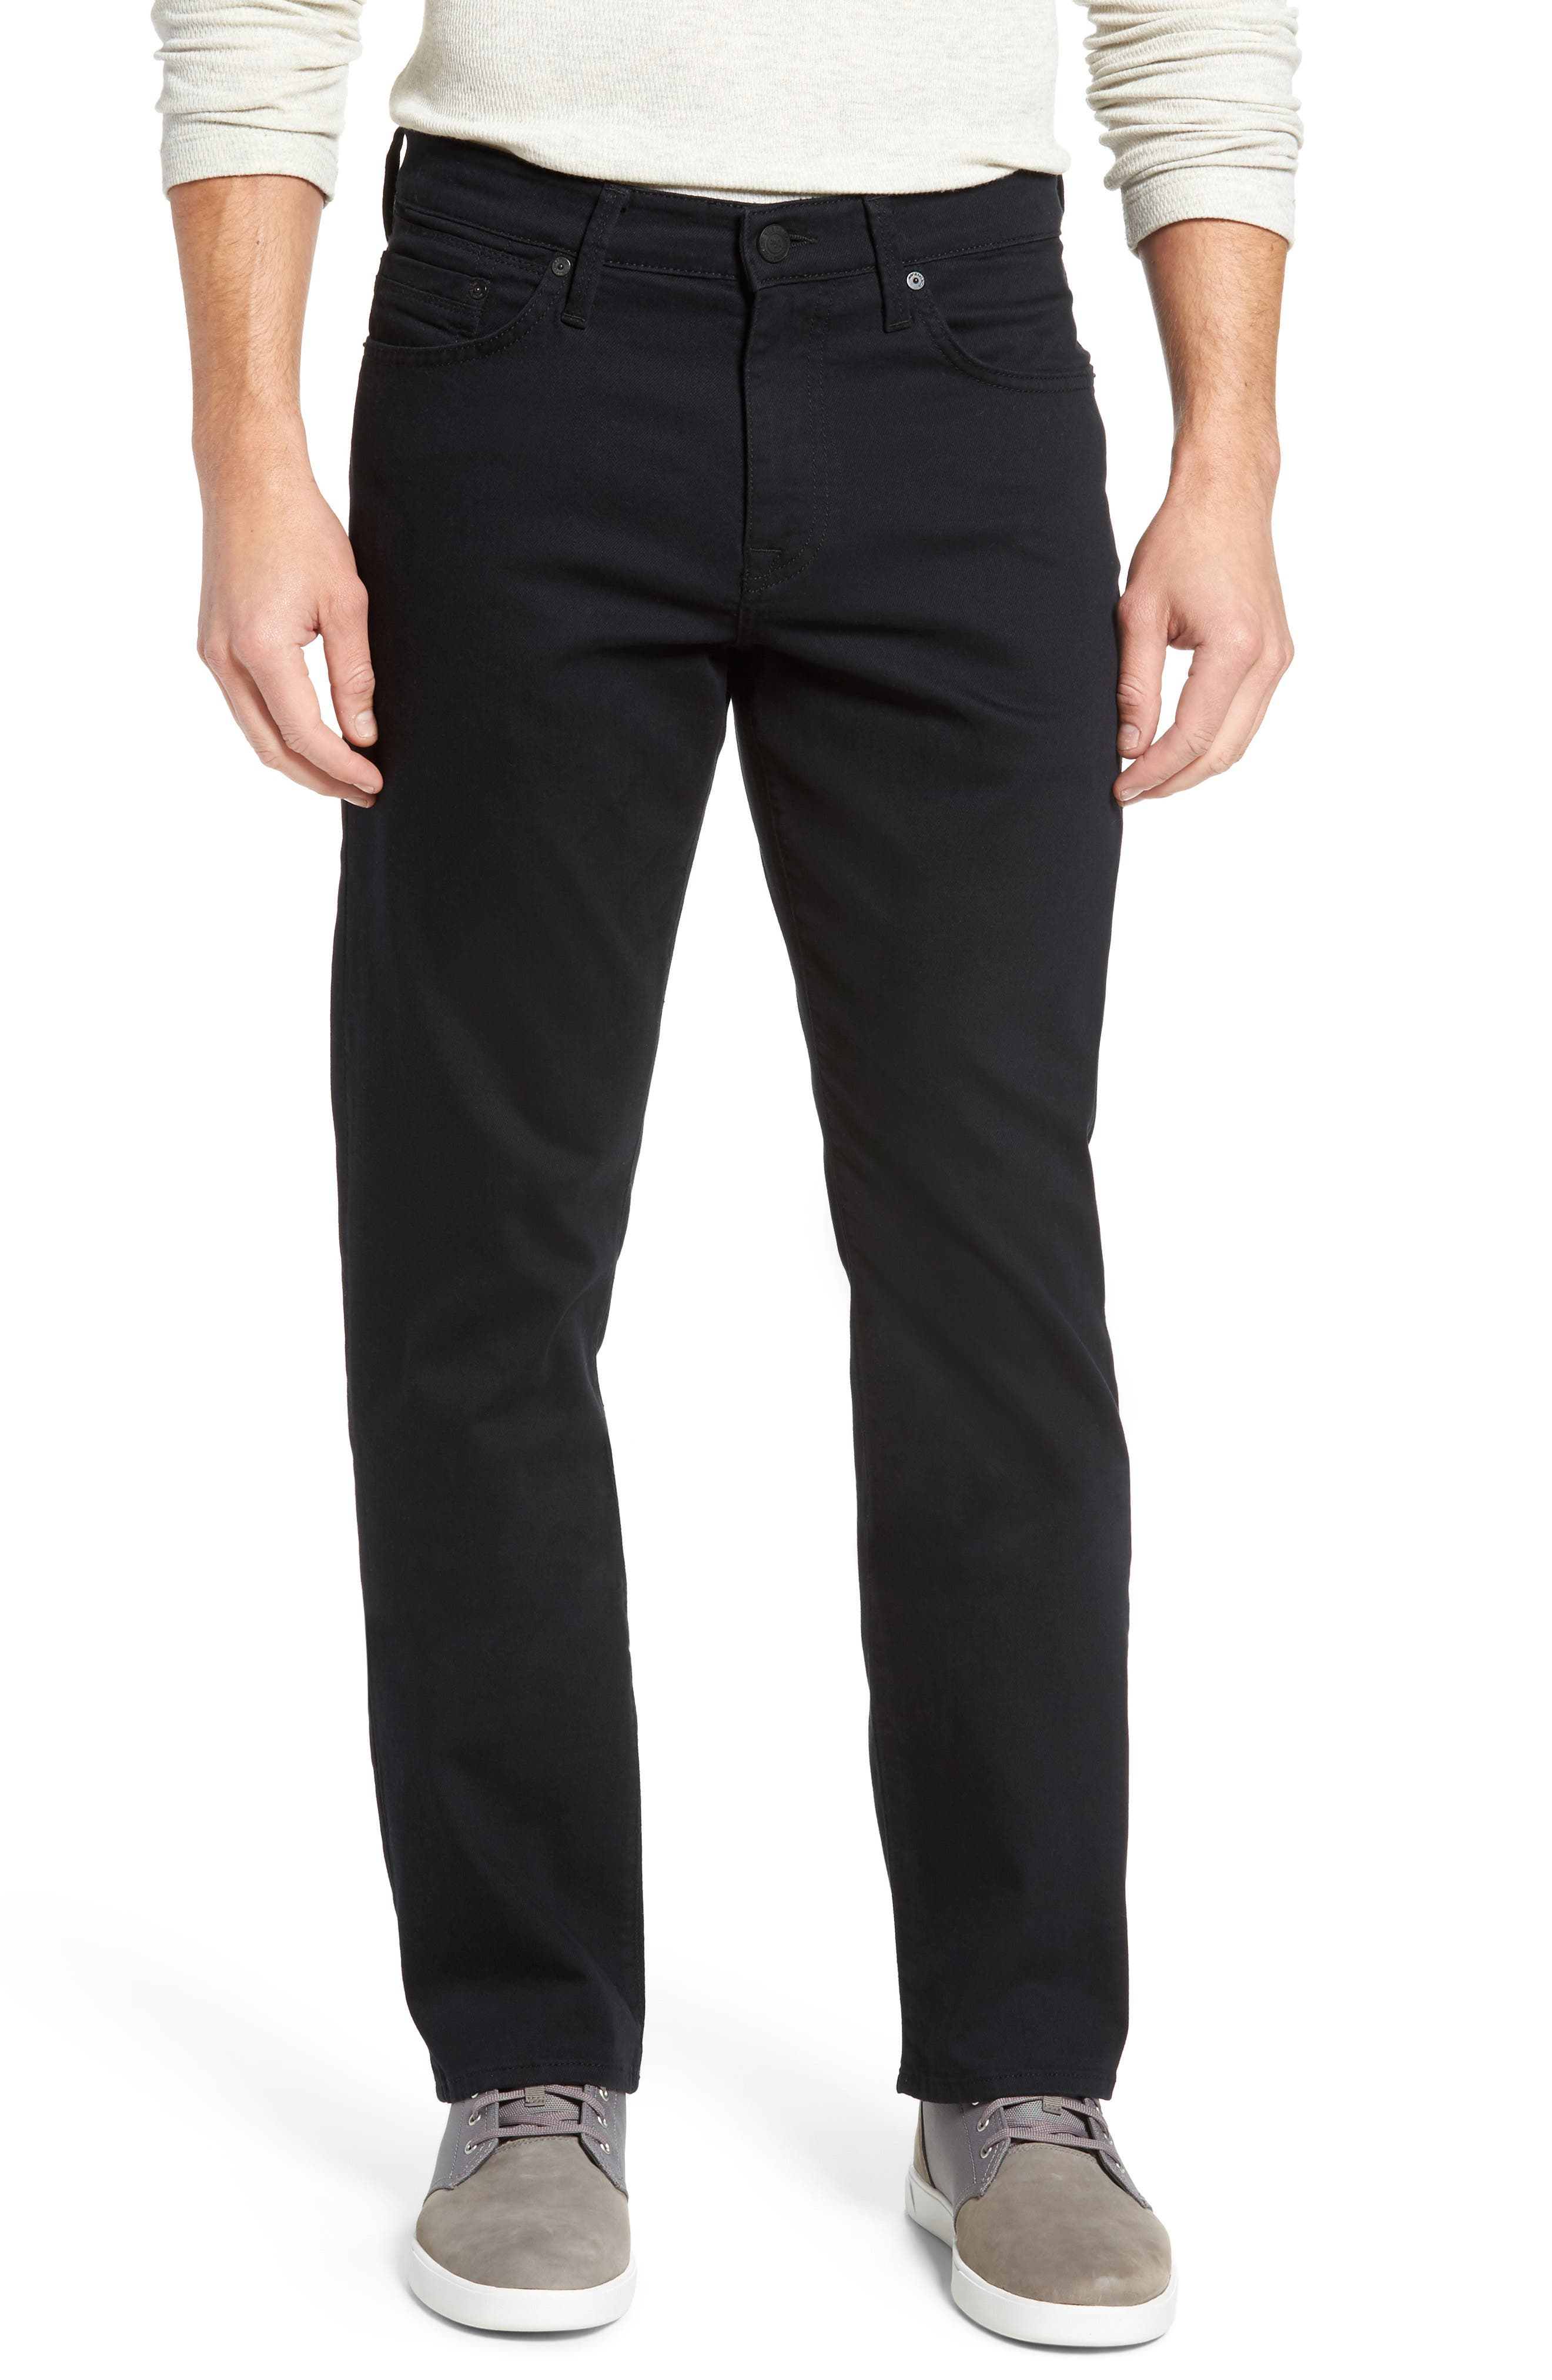 Main Image - Mavi Jeans Matt Relaxed Fit Jeans (Black Williamsburg)